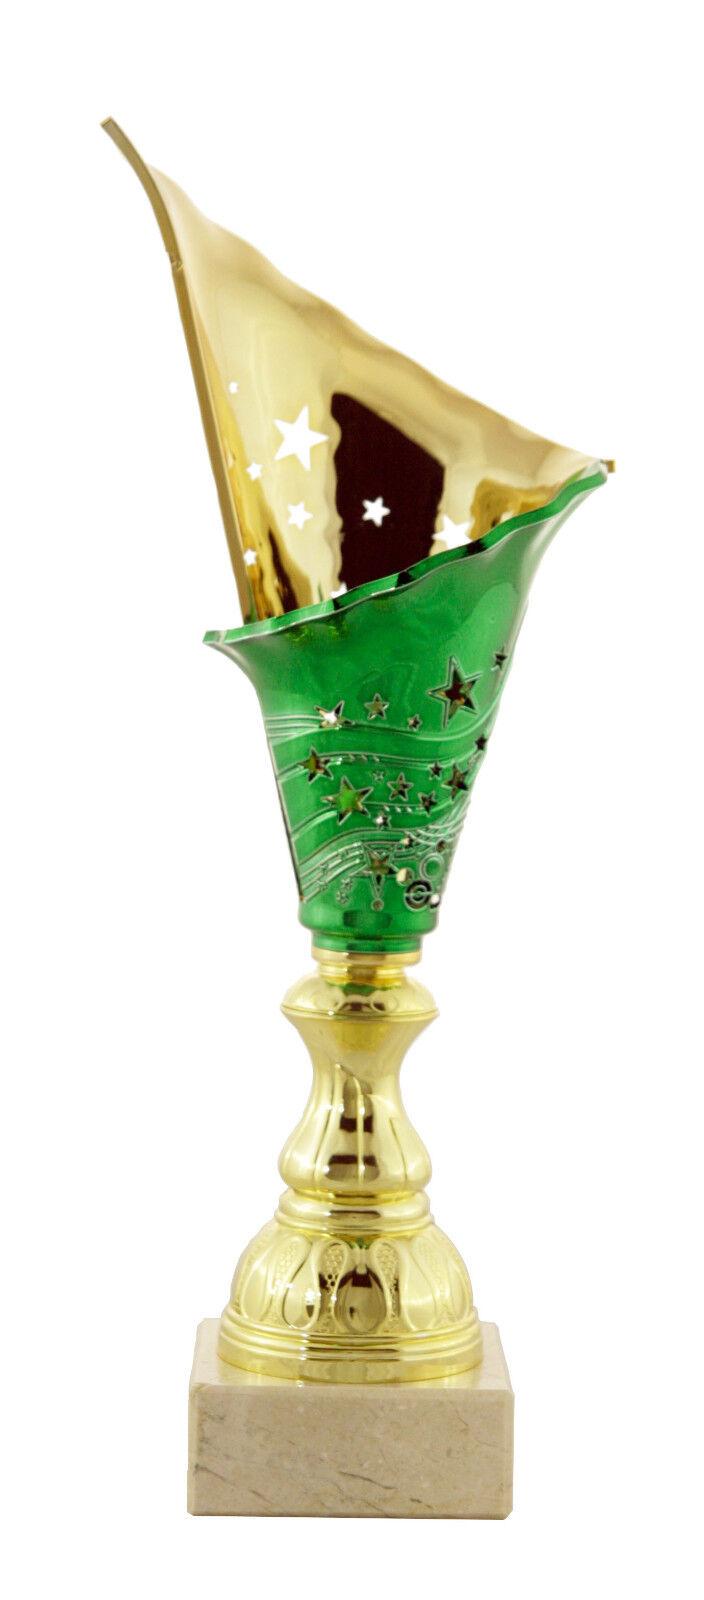 Top Pokal   3er Pokalserie San Farben, José, 6 Farben, San  31,5 - 34,5 cm inkl. Gravur 9be3f4